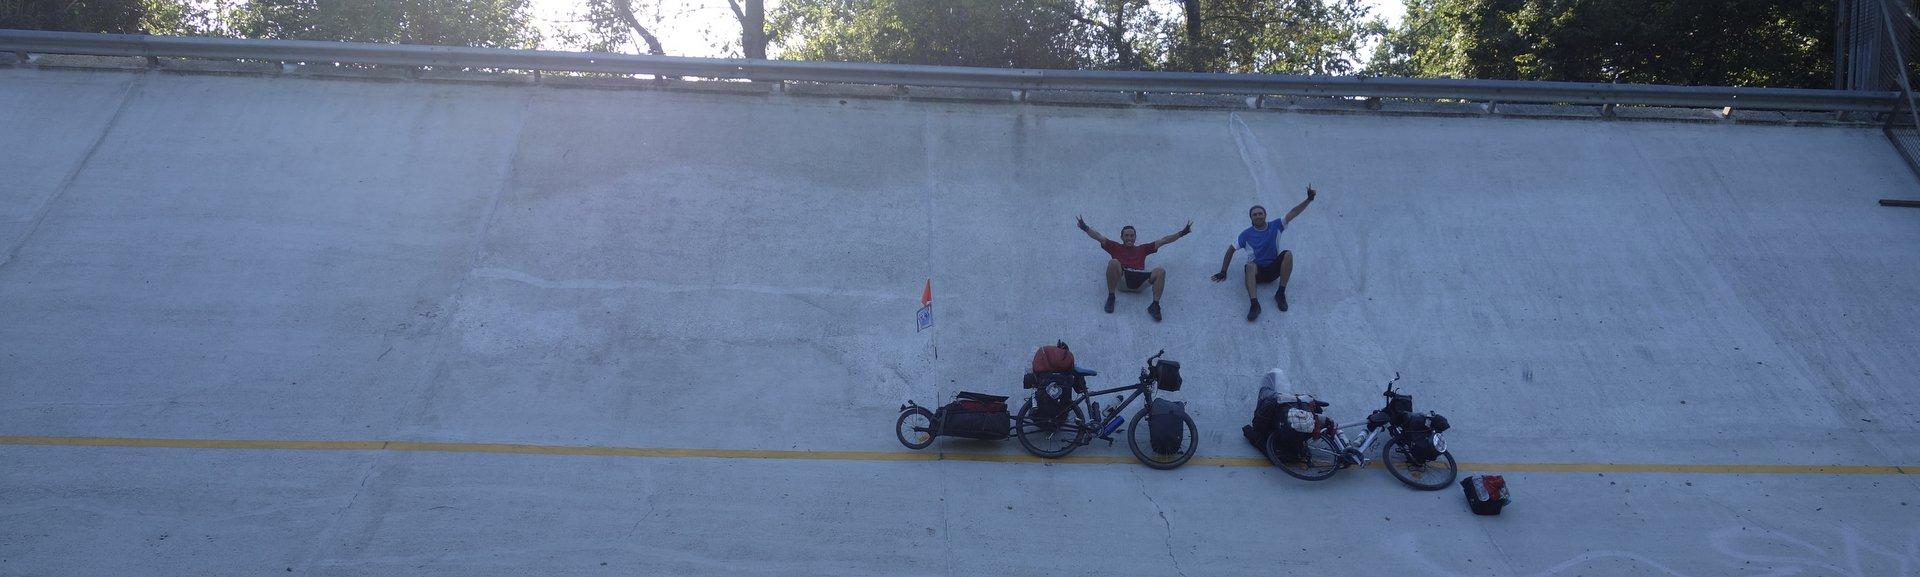 cicloturismo monza oval